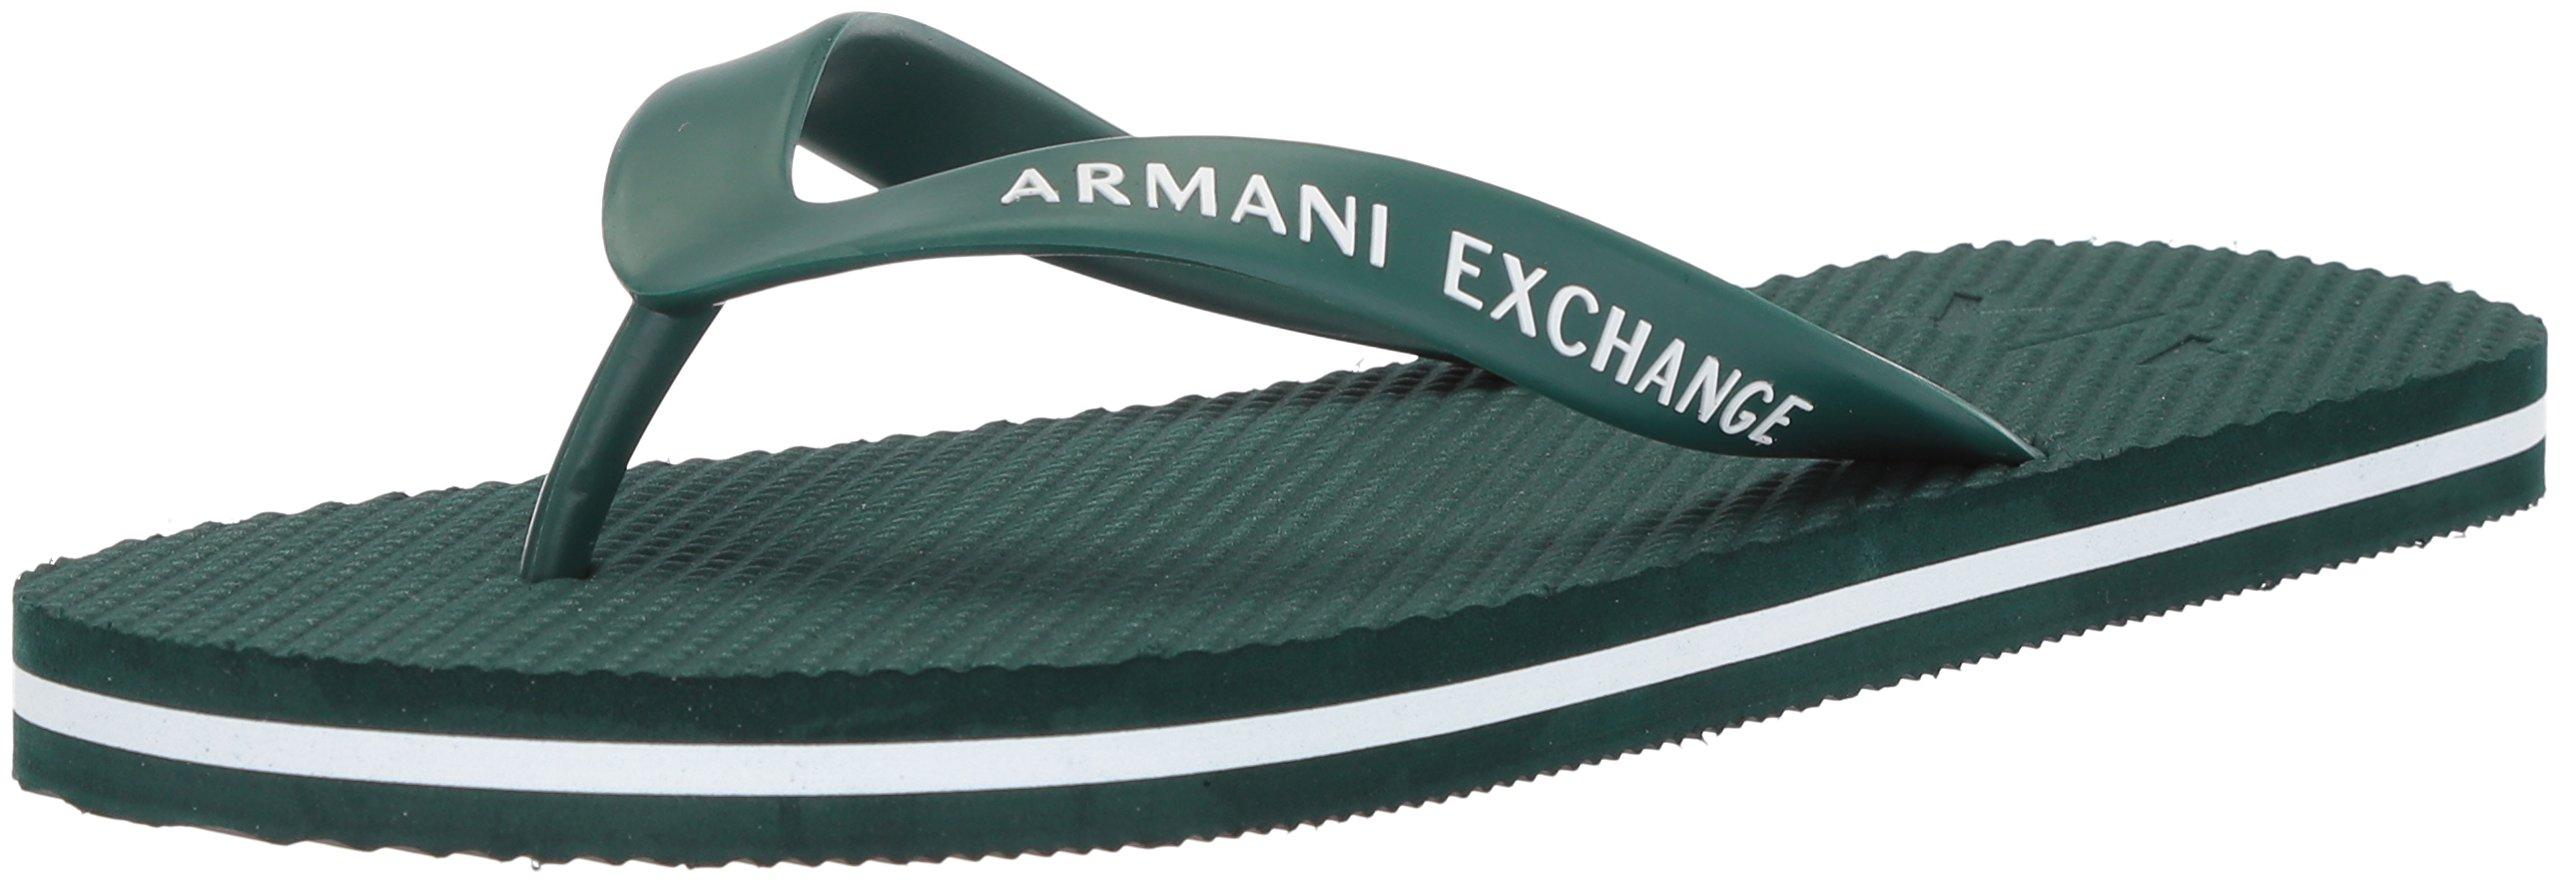 A|X Armani Exchange Men's Solid Flip Flop, Botanical Green, 8 Medium US